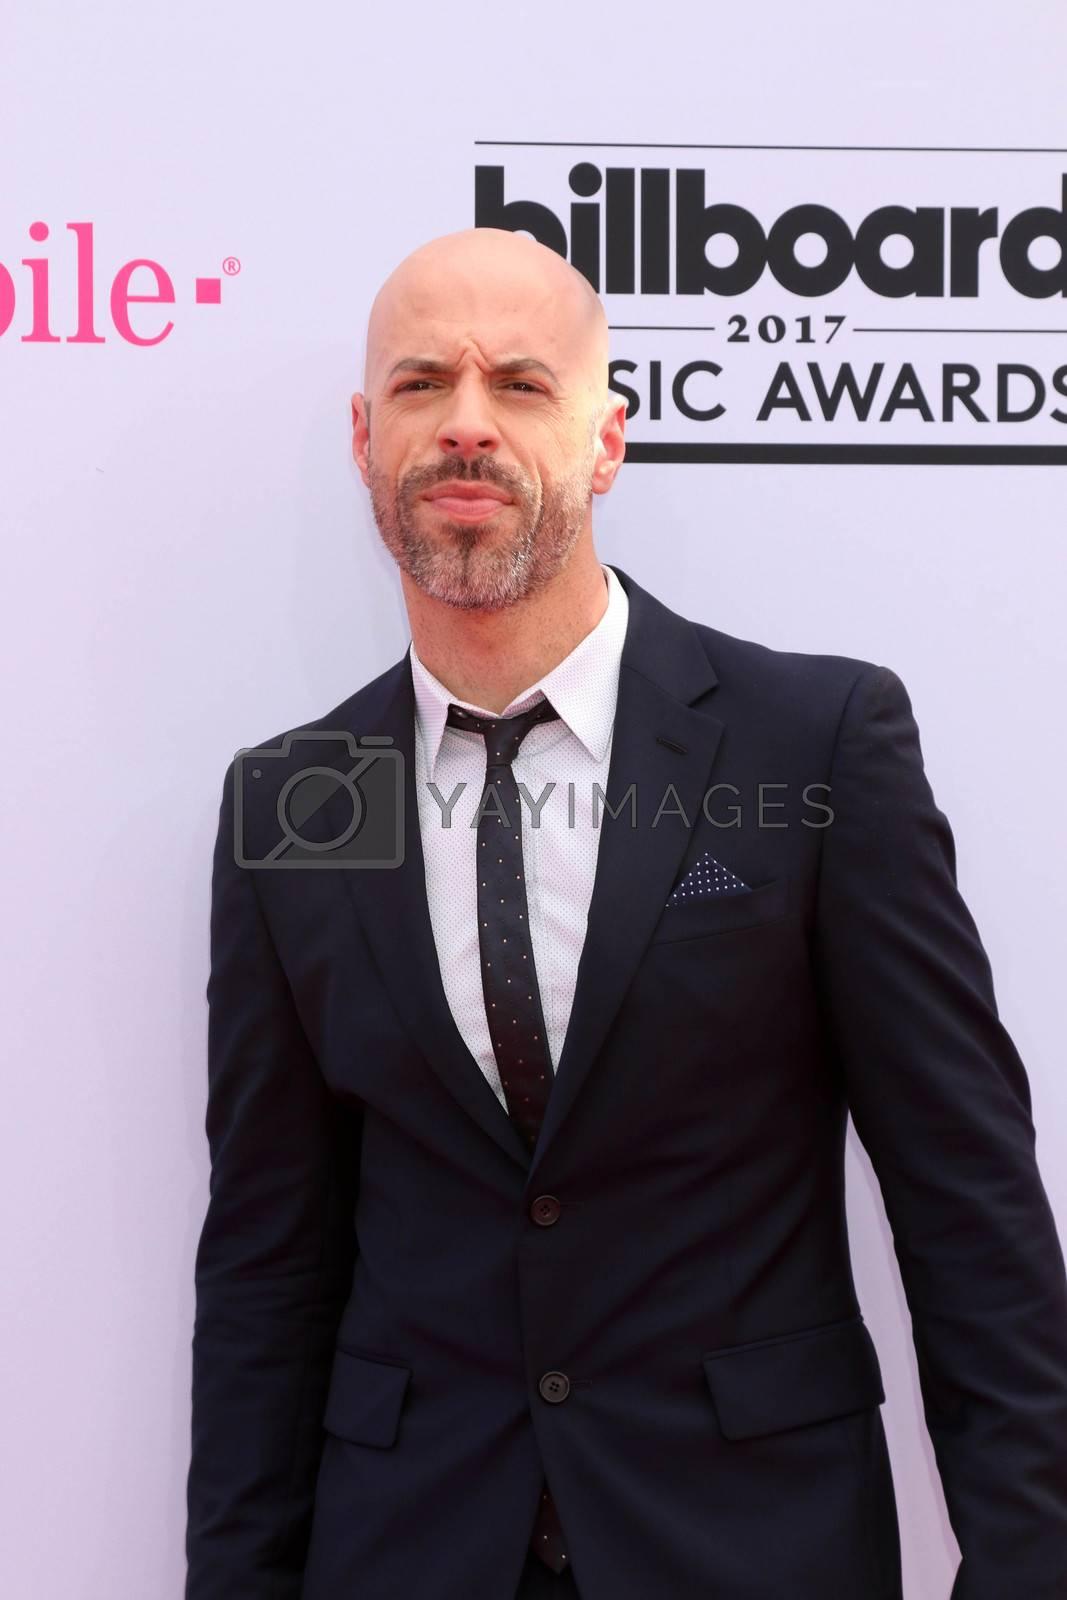 Chris Daughtry at the 2017 Billboard Awards Arrivals, T-Mobile Arena, Las Vegas, NV 05-21-17